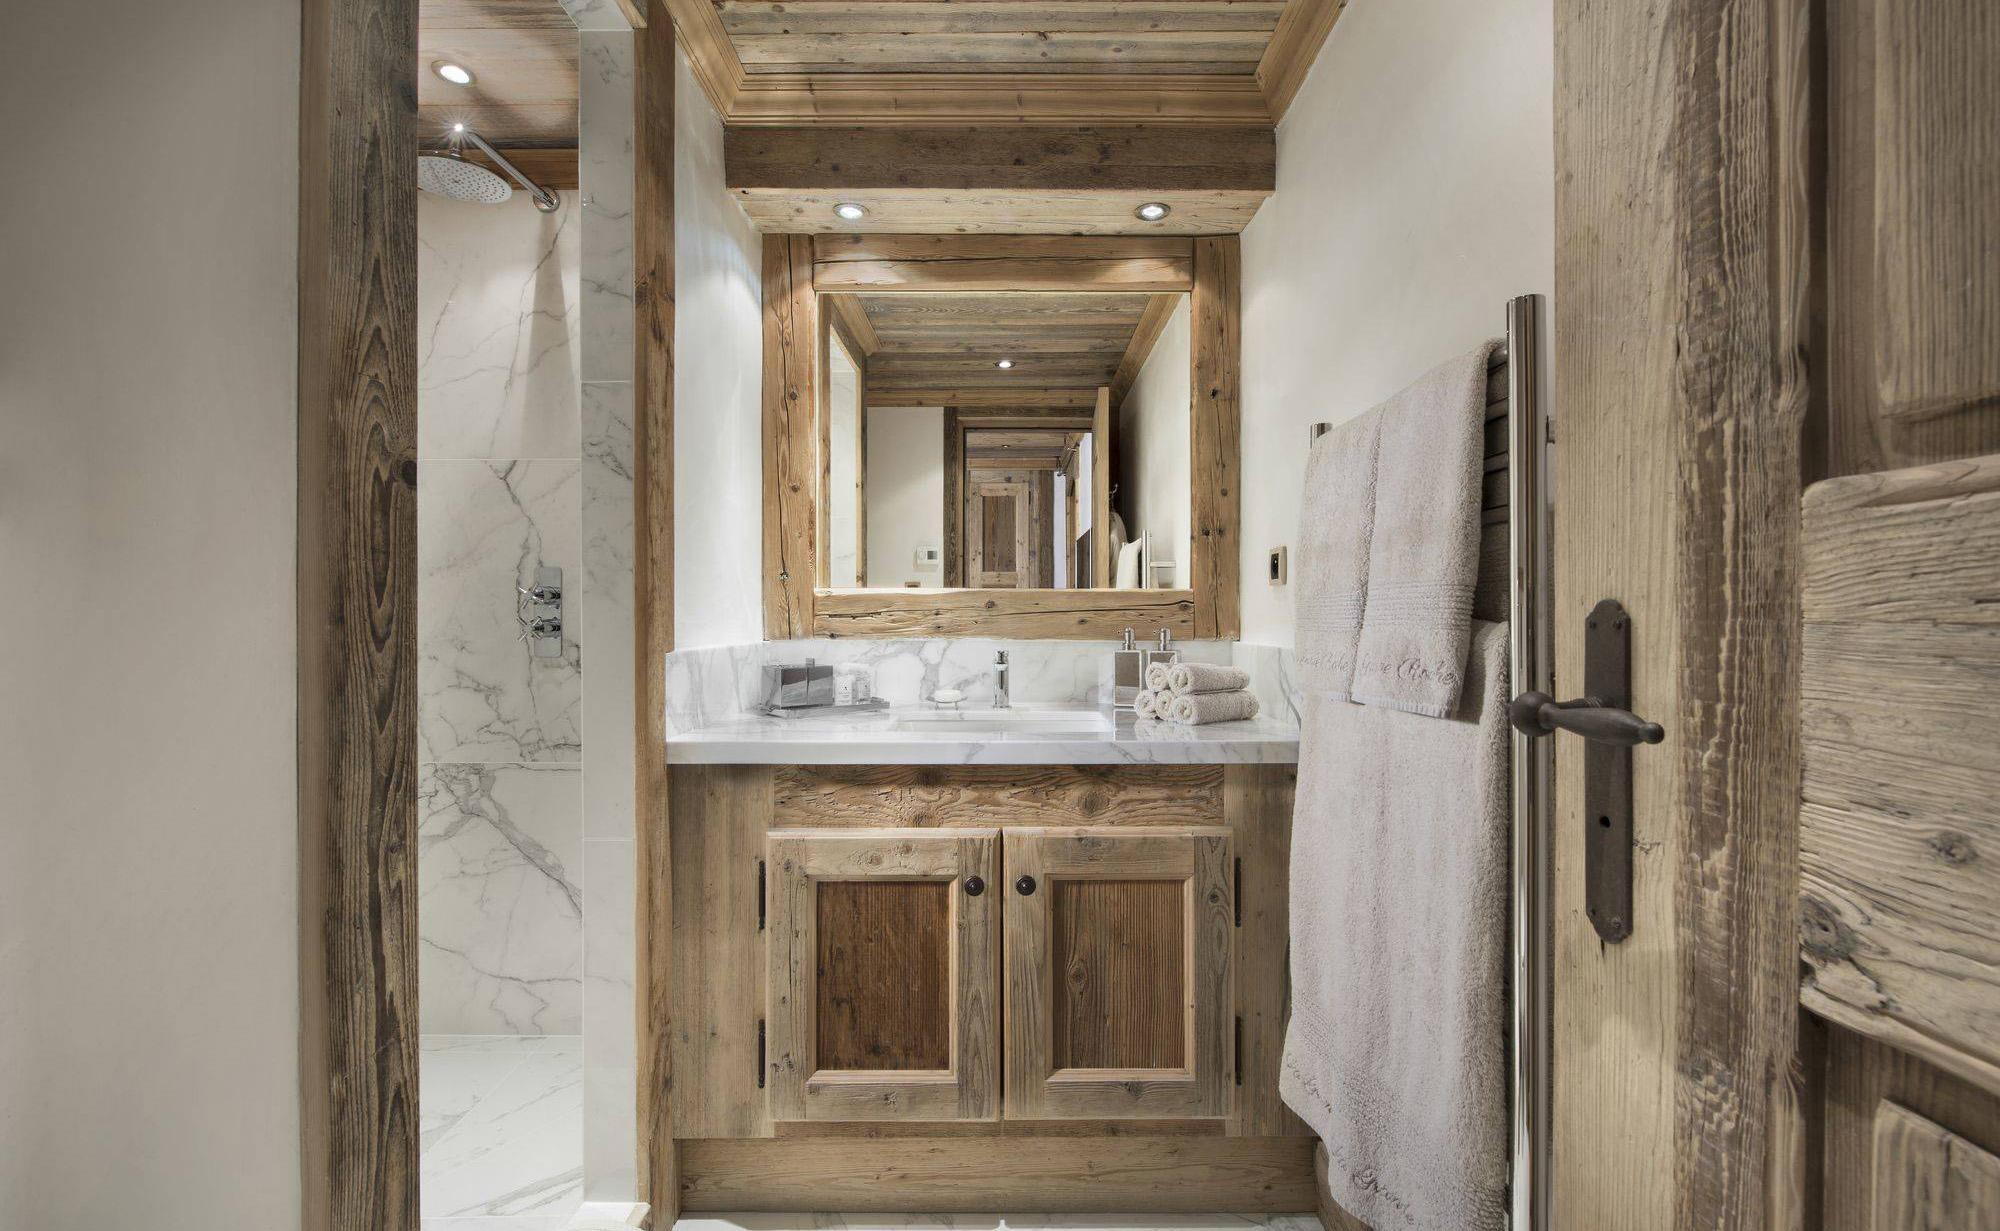 Lovelydays luxury service apartment rental - Courchevel - Great Roc Chalet - Partner - 7 bedrooms - 6 bathrooms - Lovely shower - afcbb8aa6c9e - Lovelydays